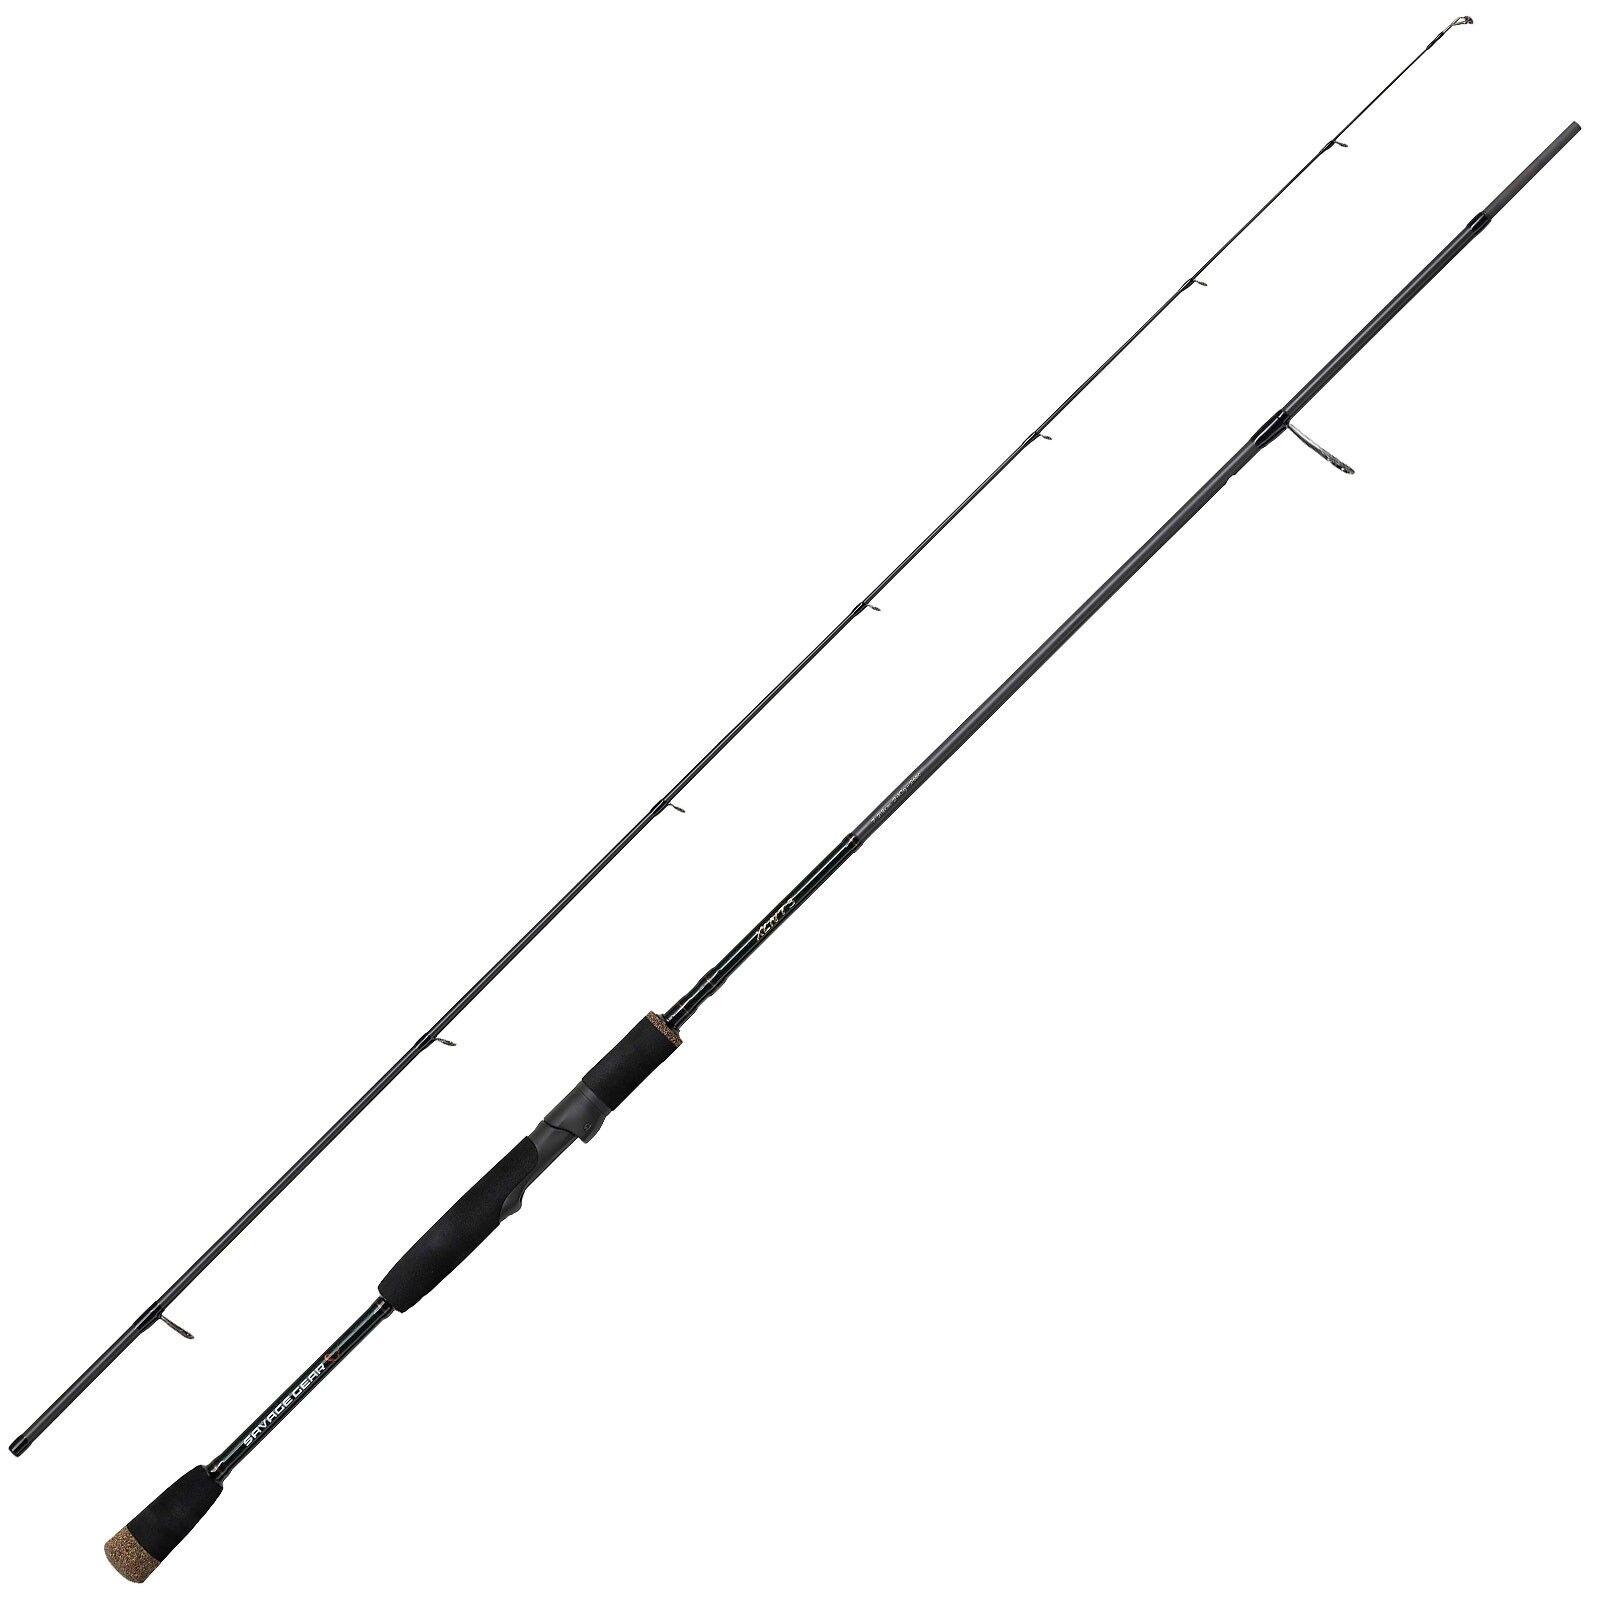 Savage Gear Spinnrute – XLNT3 7ft 2,13m 40-80g 2 teilig